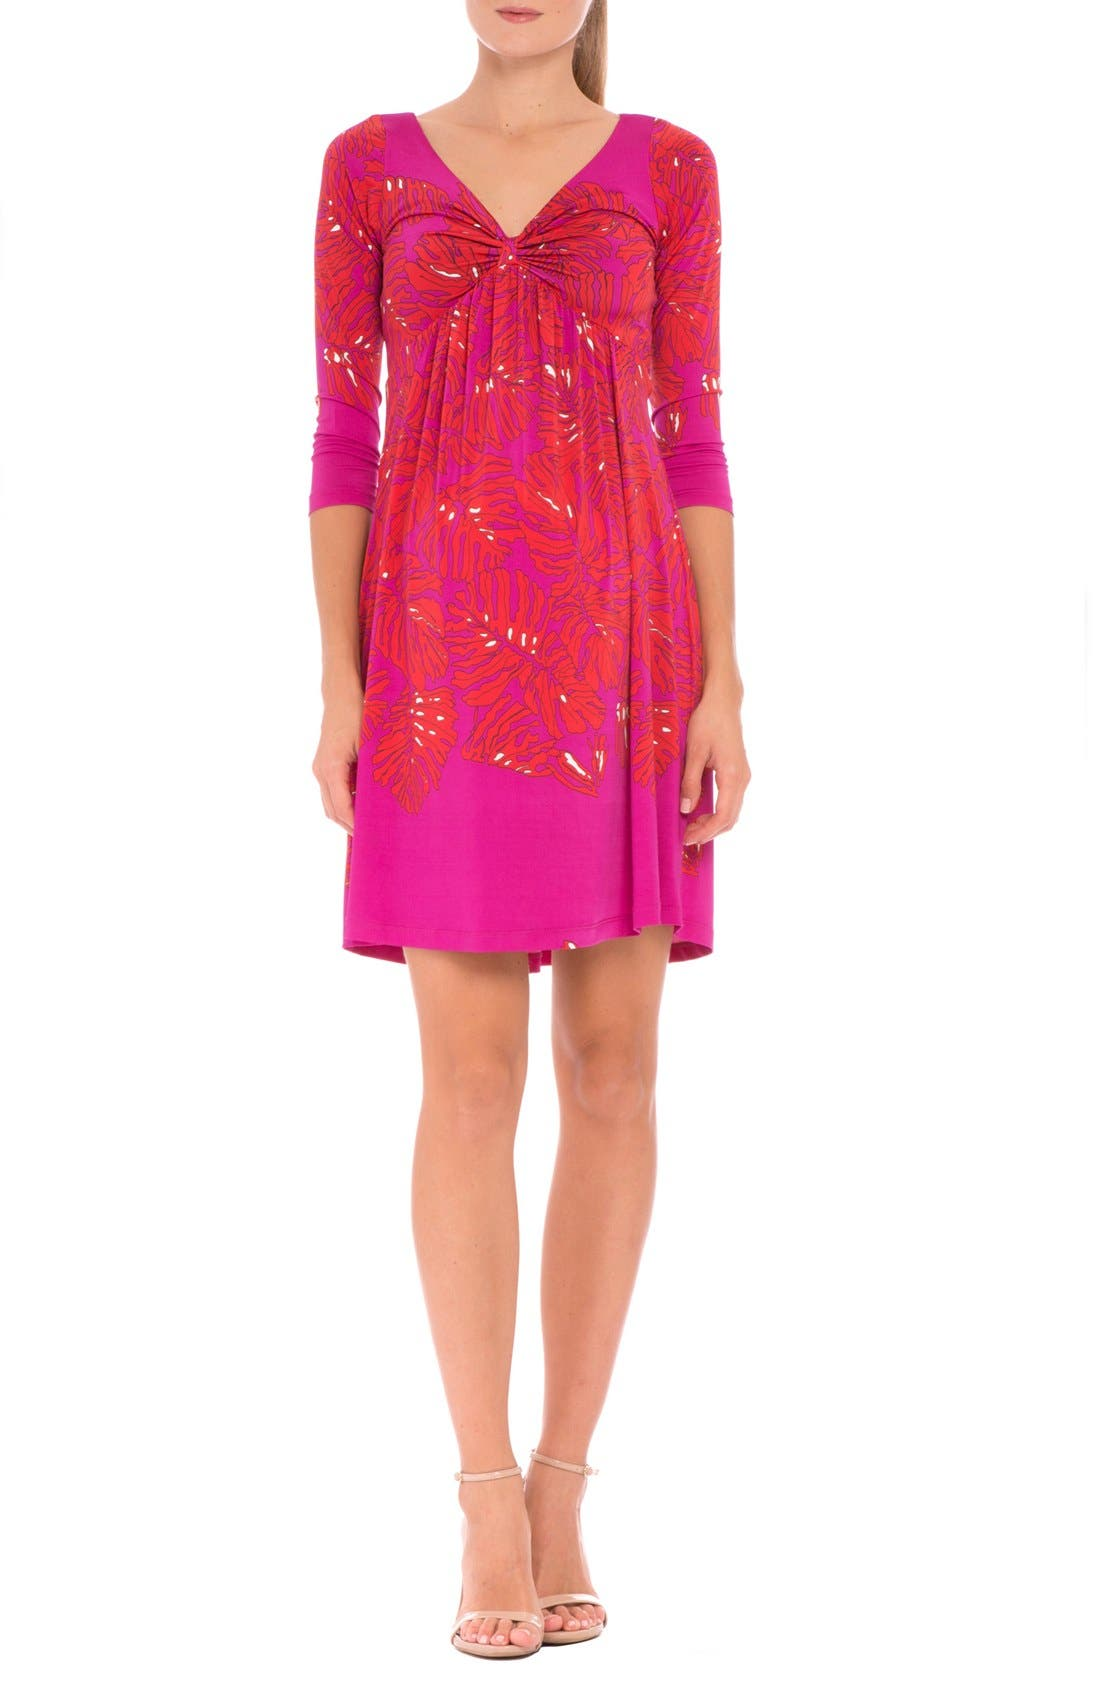 OLIAN 'Scarlet' Print Maternity Dress